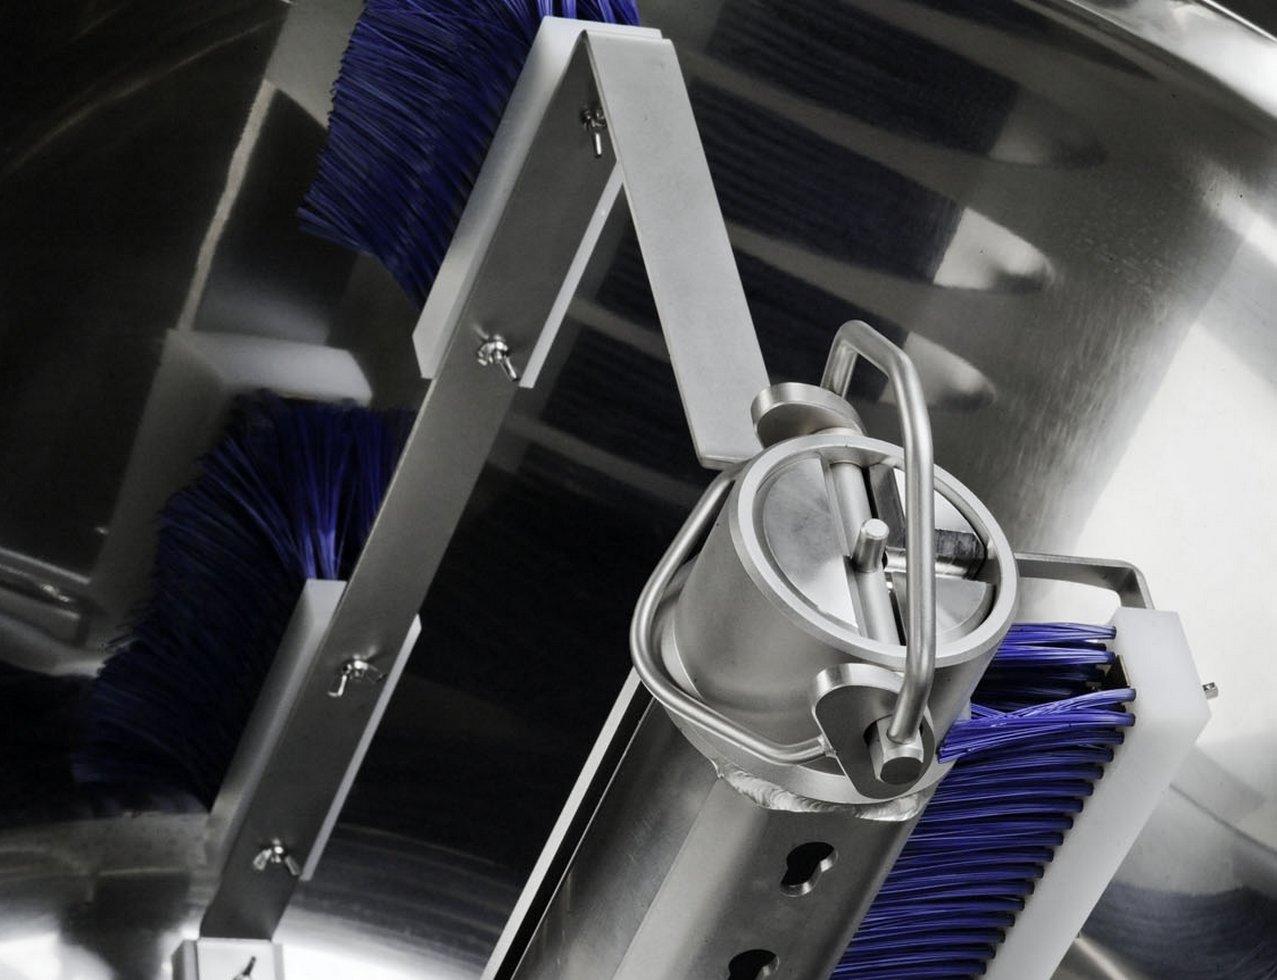 dieta-mixer-tool-washing-tool